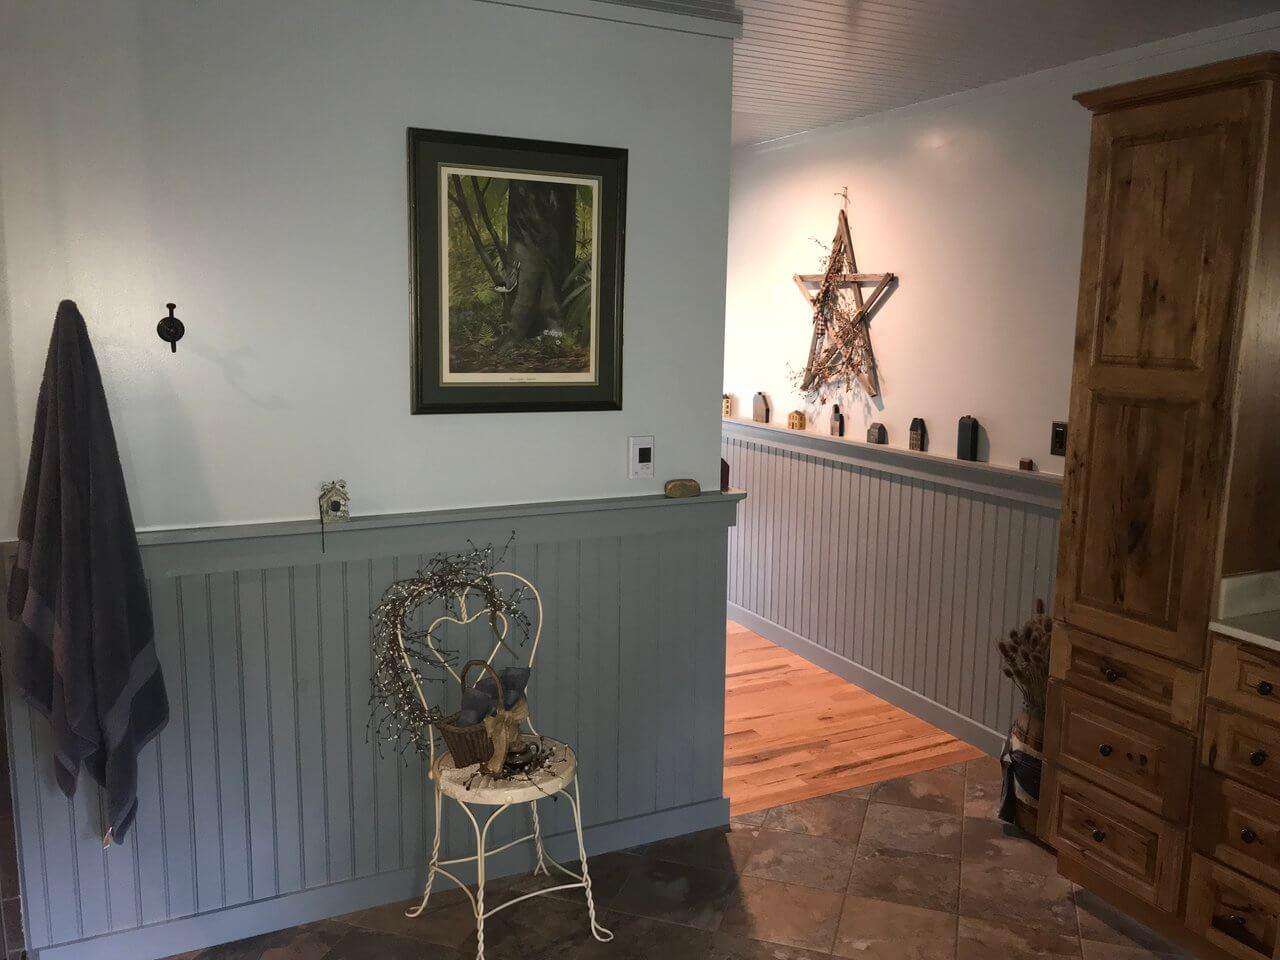 Primitive Decoration In The Bathroom Primitive Mountain